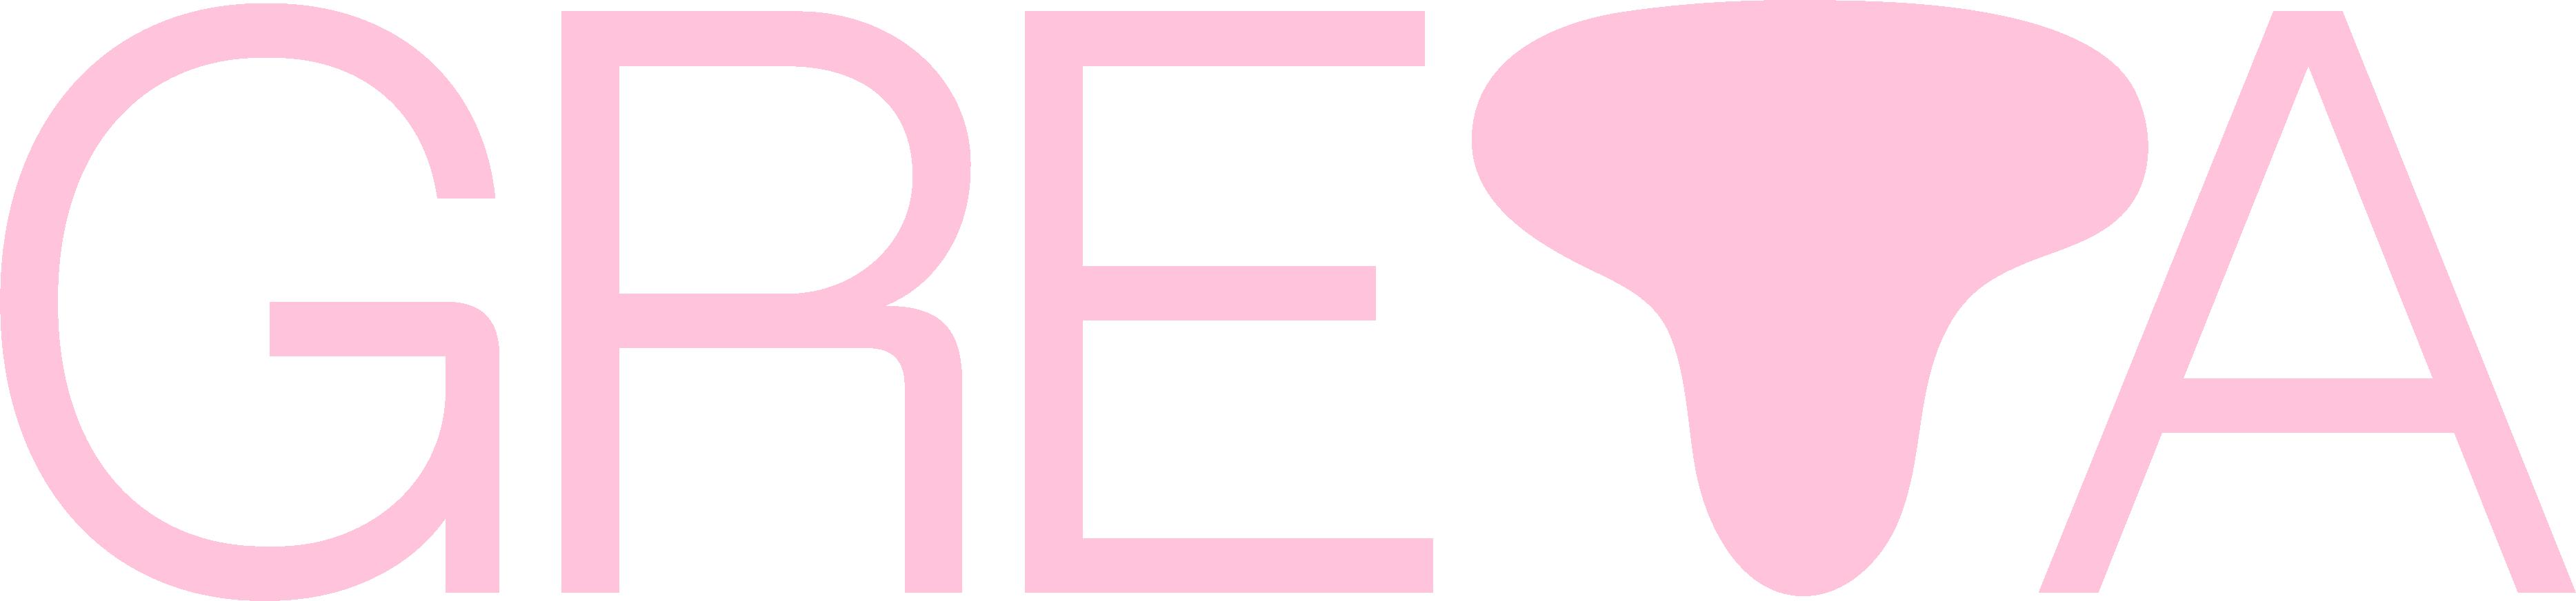 greta logo rosa